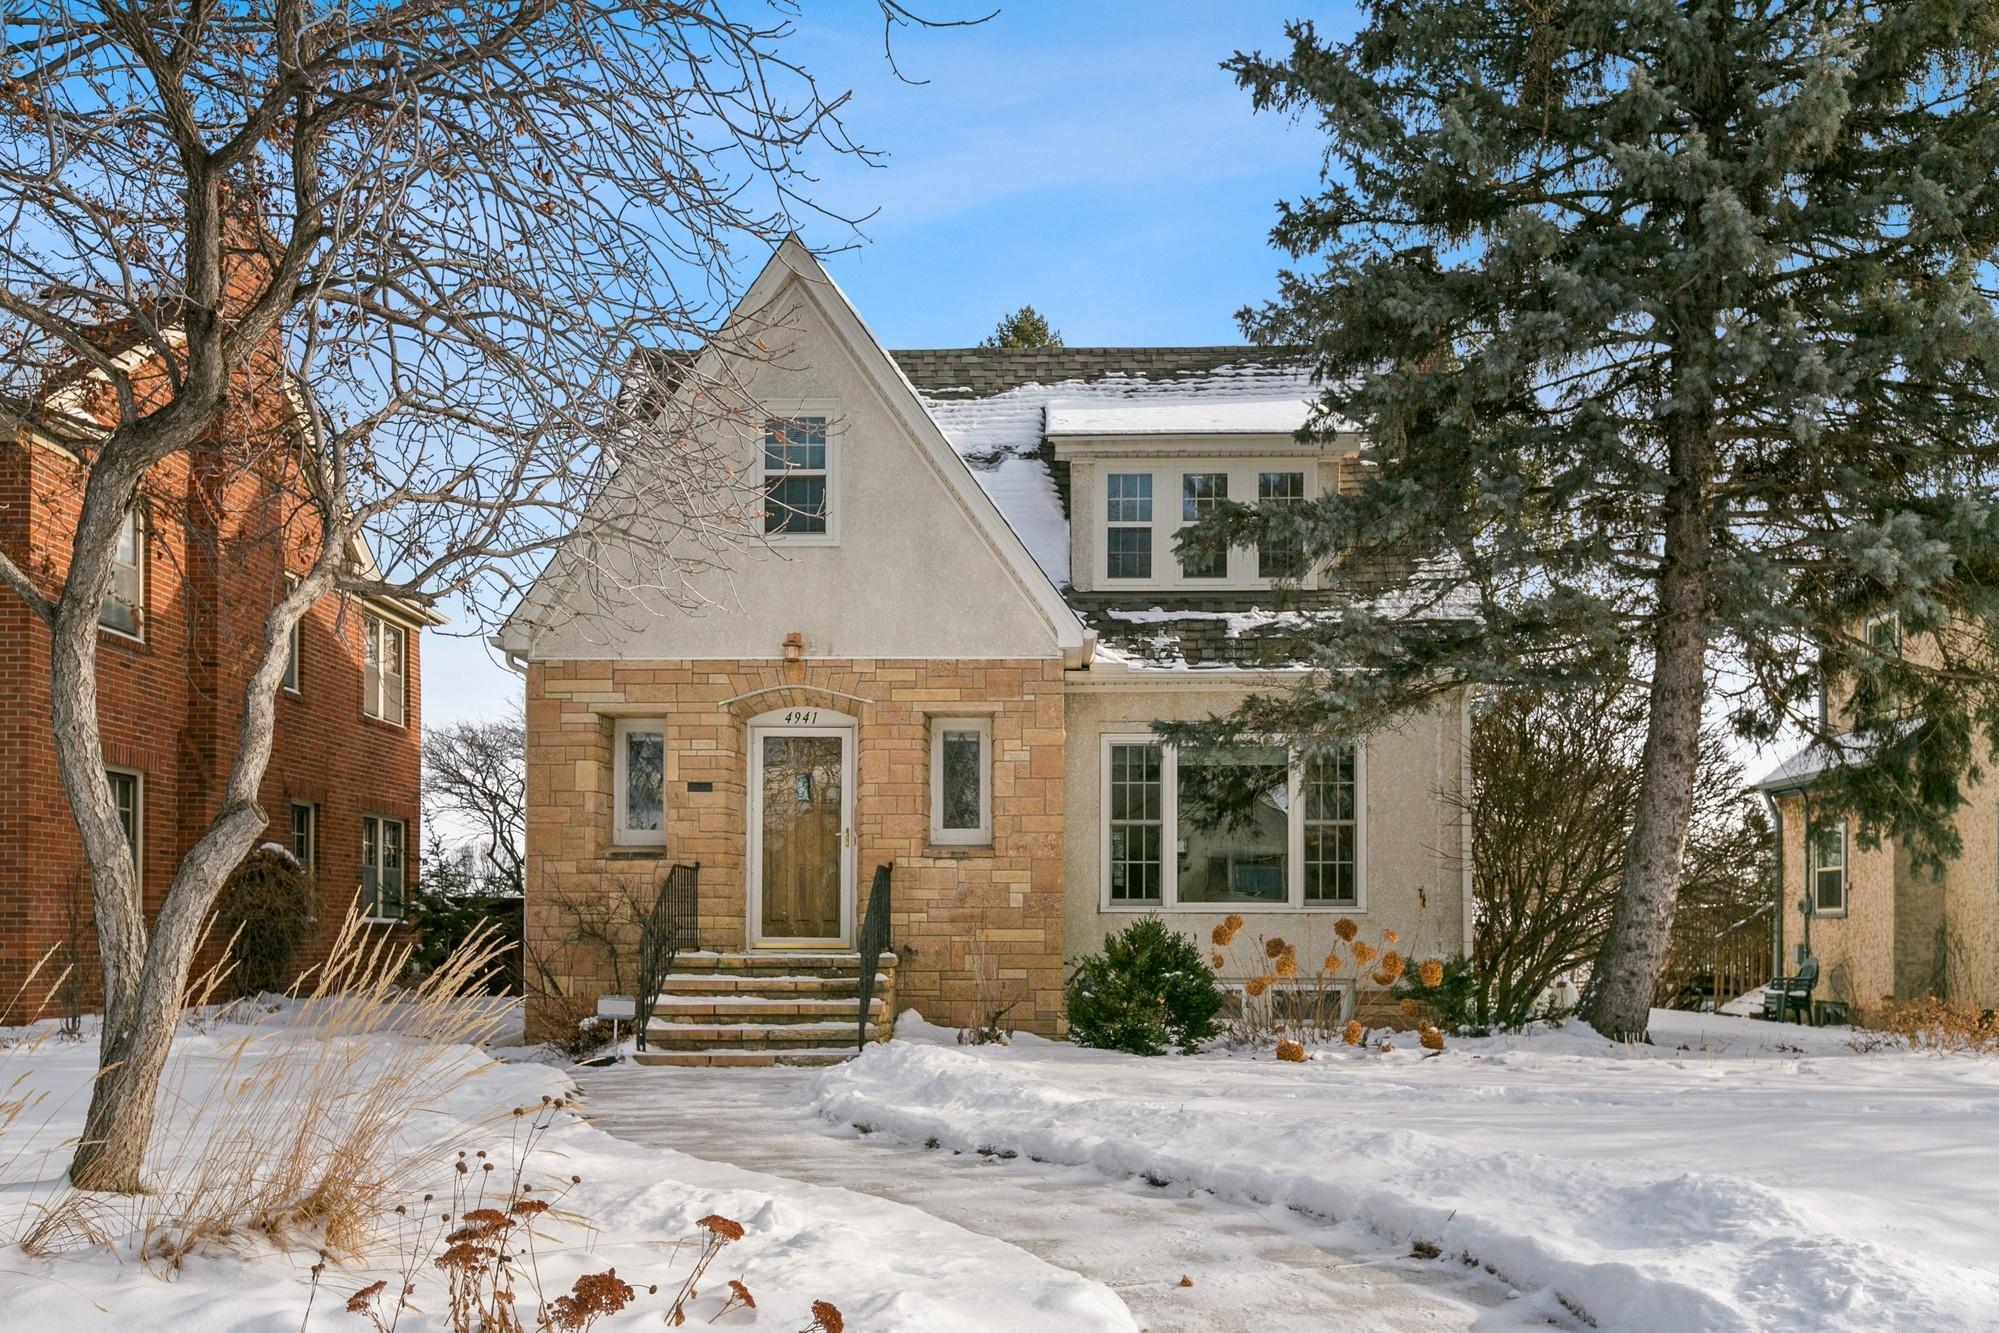 4941 17th Avenue S Property Photo - Minneapolis, MN real estate listing